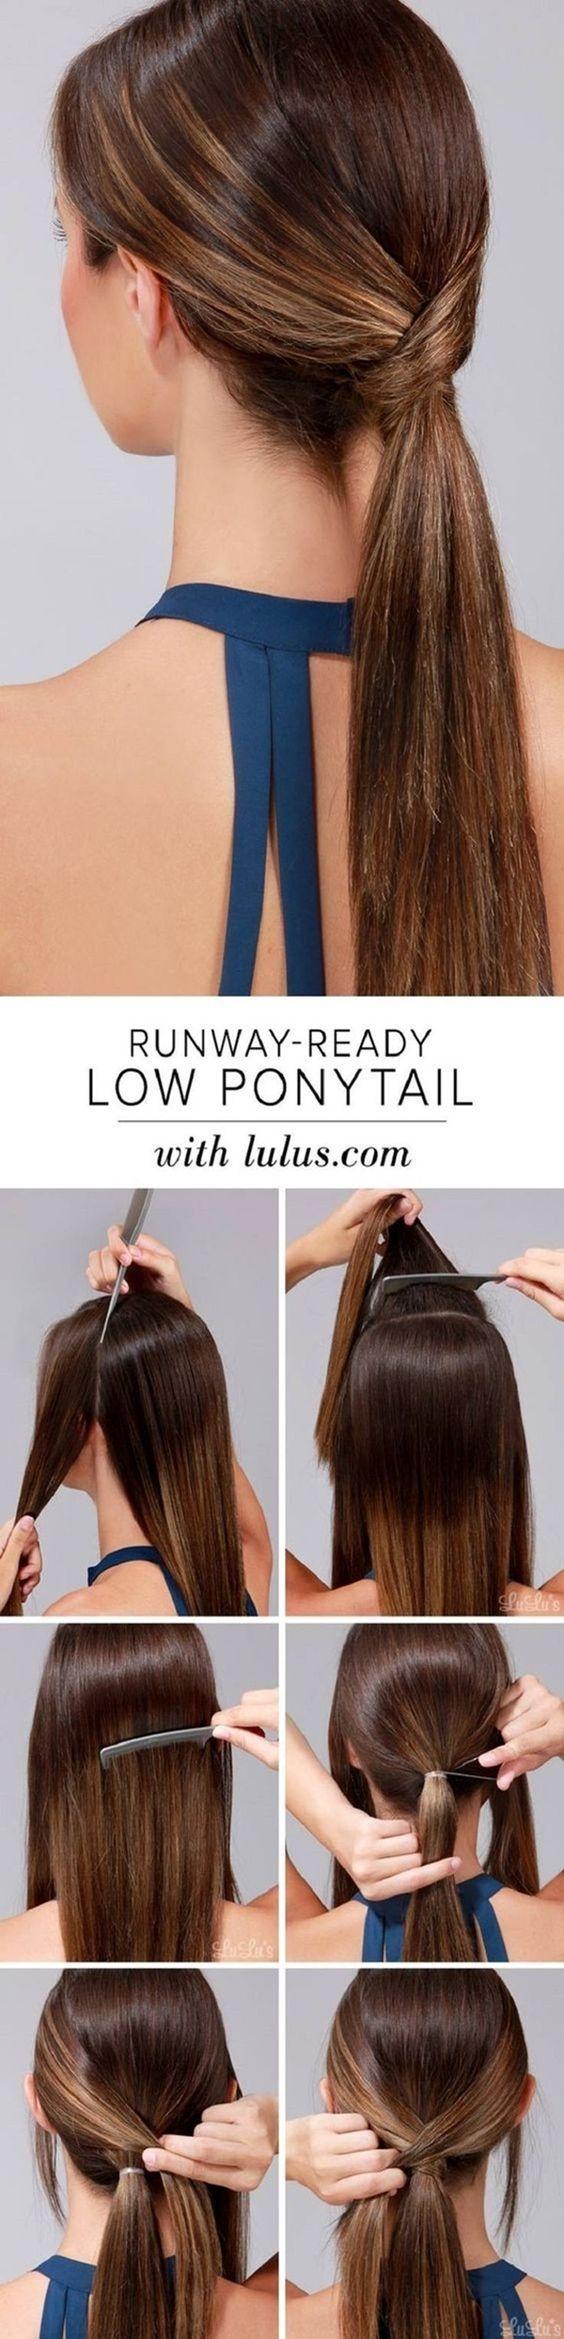 best 25+ easy hairstyles ideas on pinterest | simple hairstyles